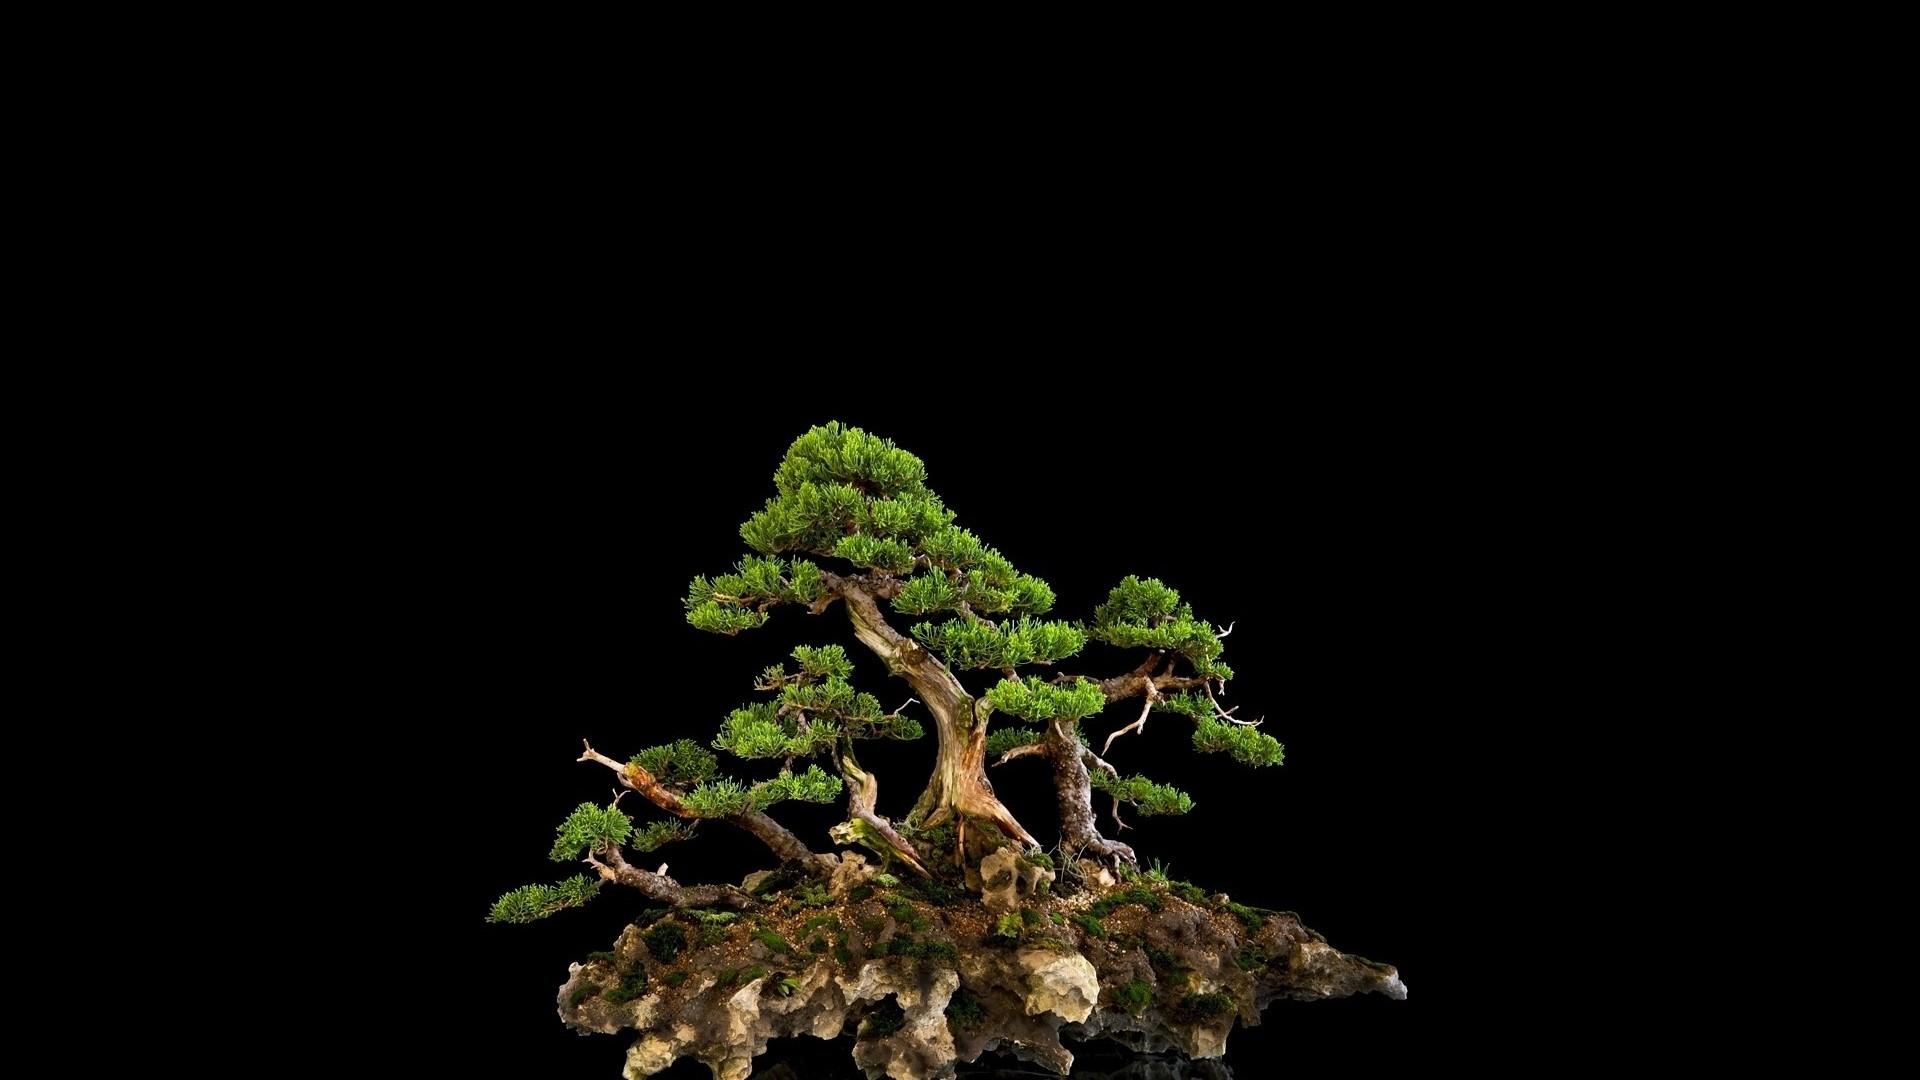 Res: 1920x1080, tree, bonsai, black background